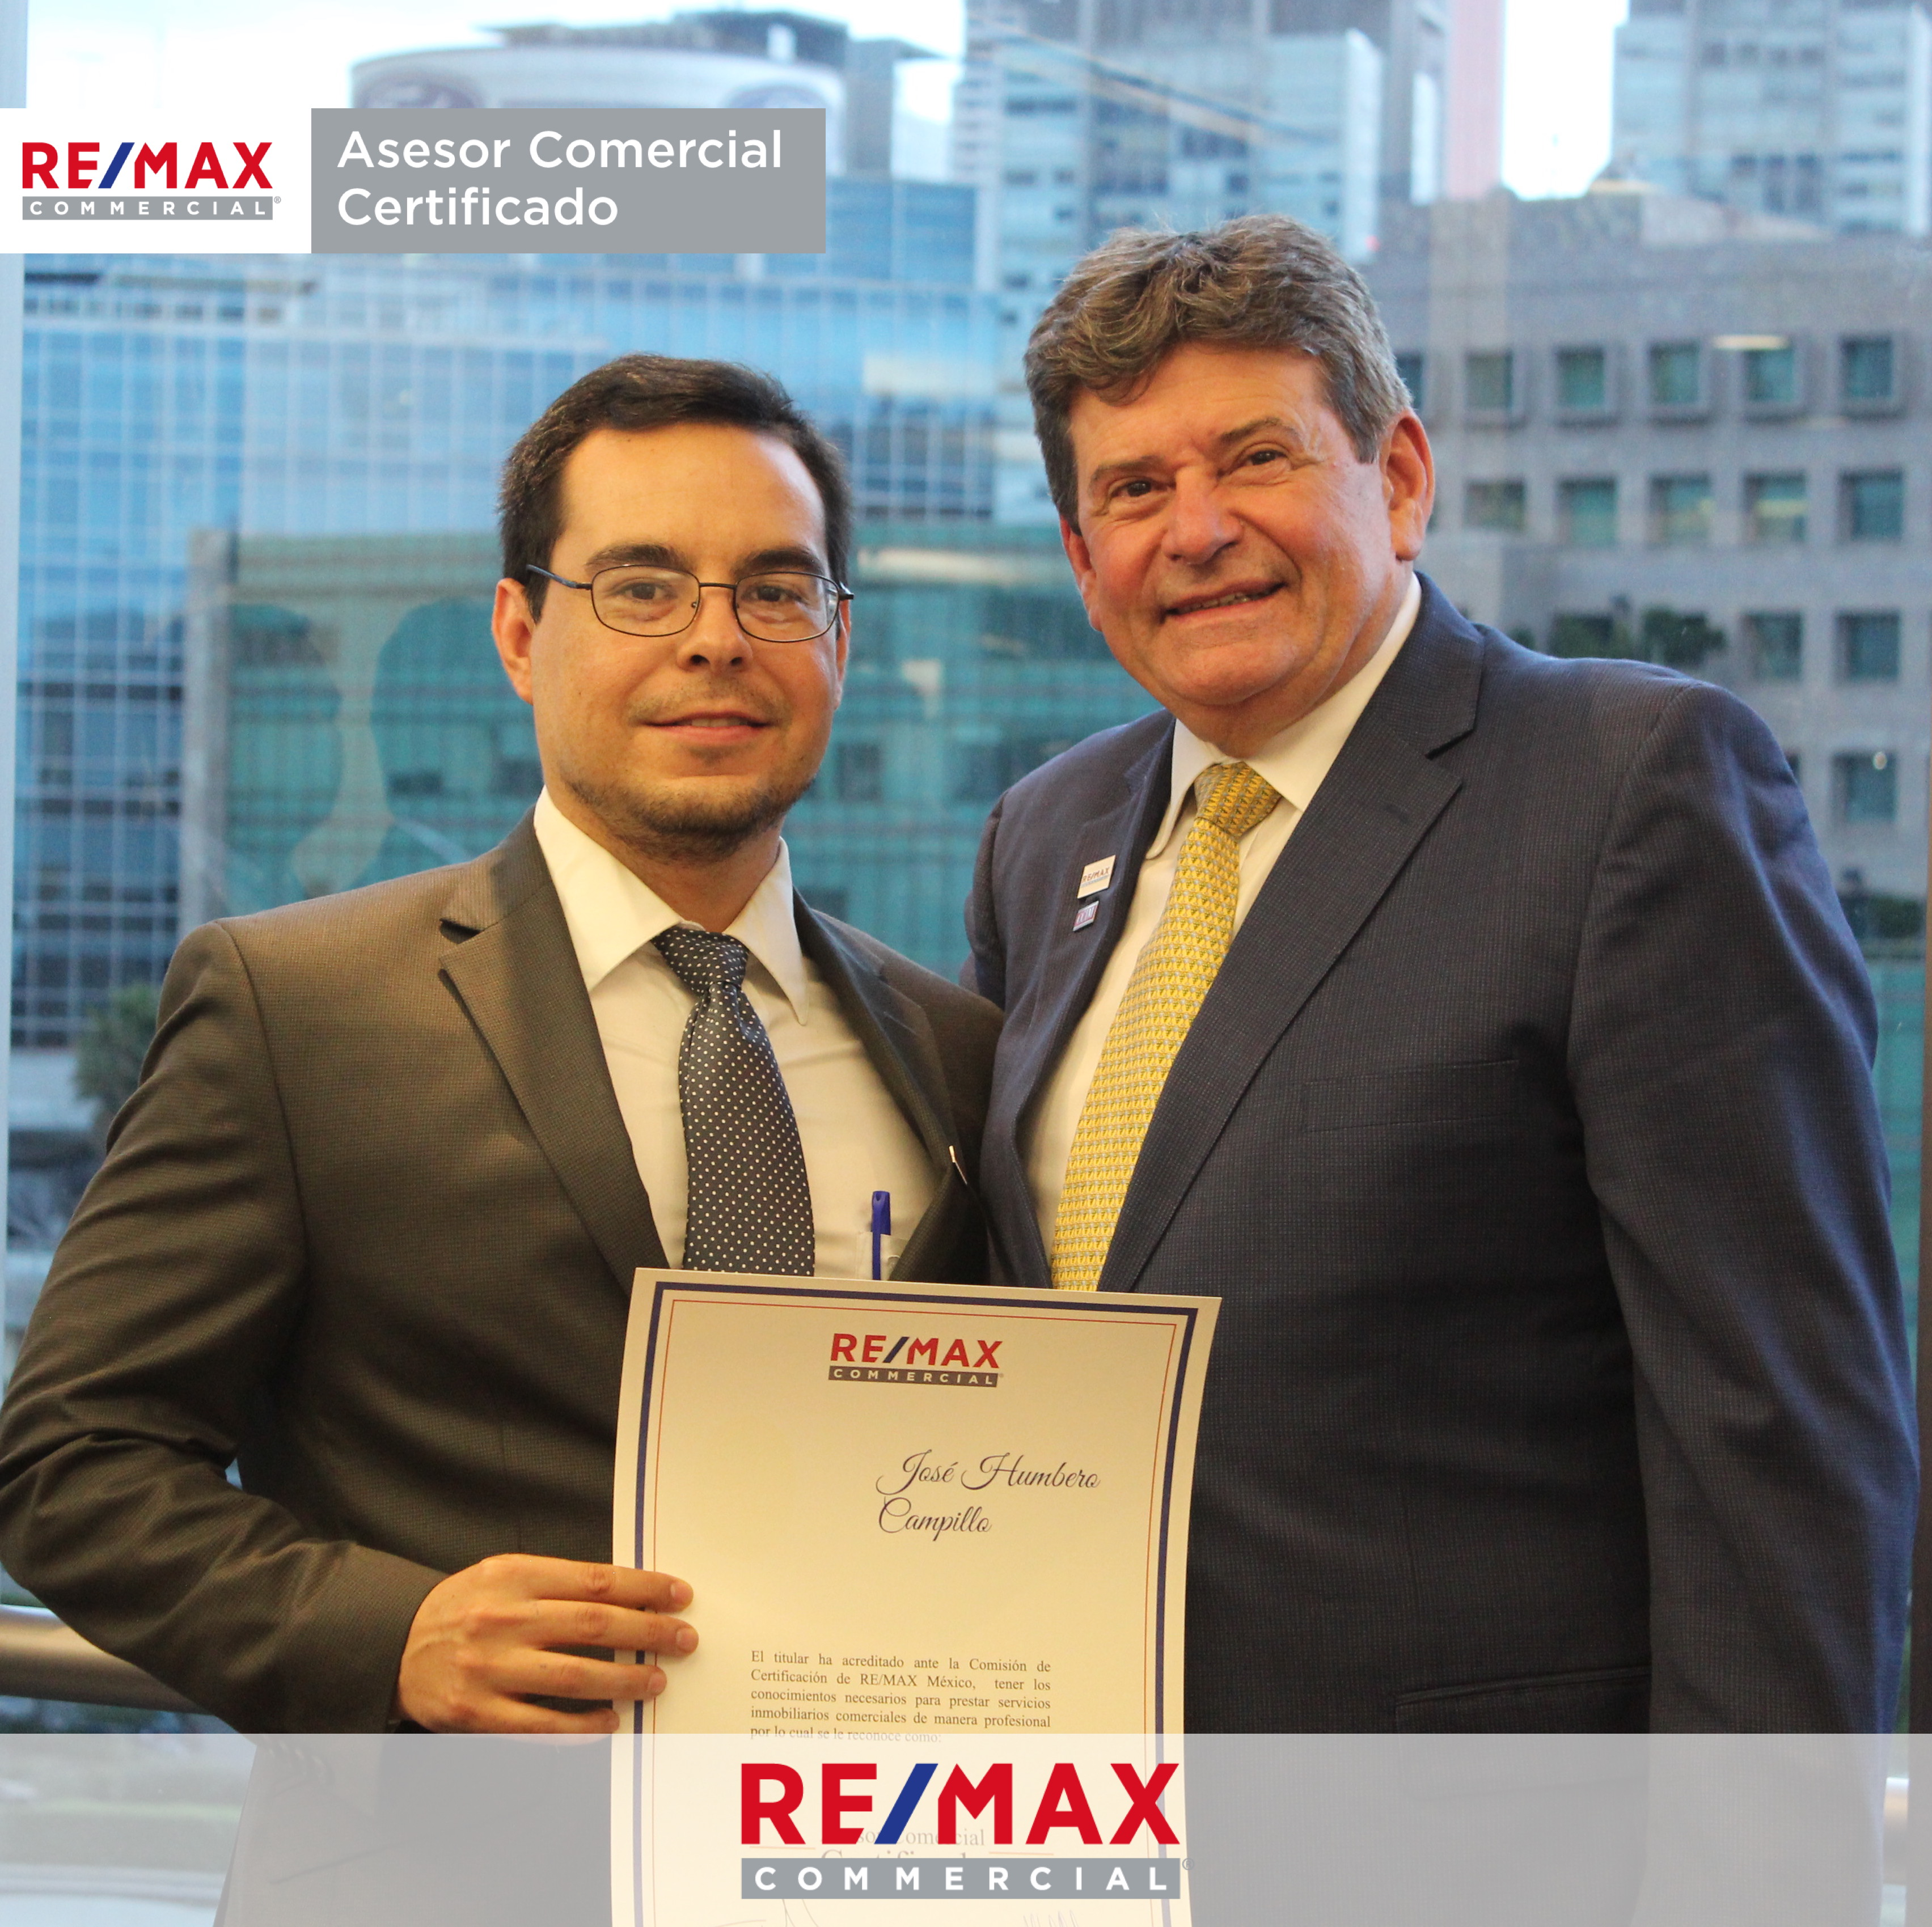 25_Certificacion_comercial_comprar_rentar_vender_casa_departamento_franquicias_inmobiliarias_REMAX_mexico_propiedades_comerciales_terrenos_bodegas